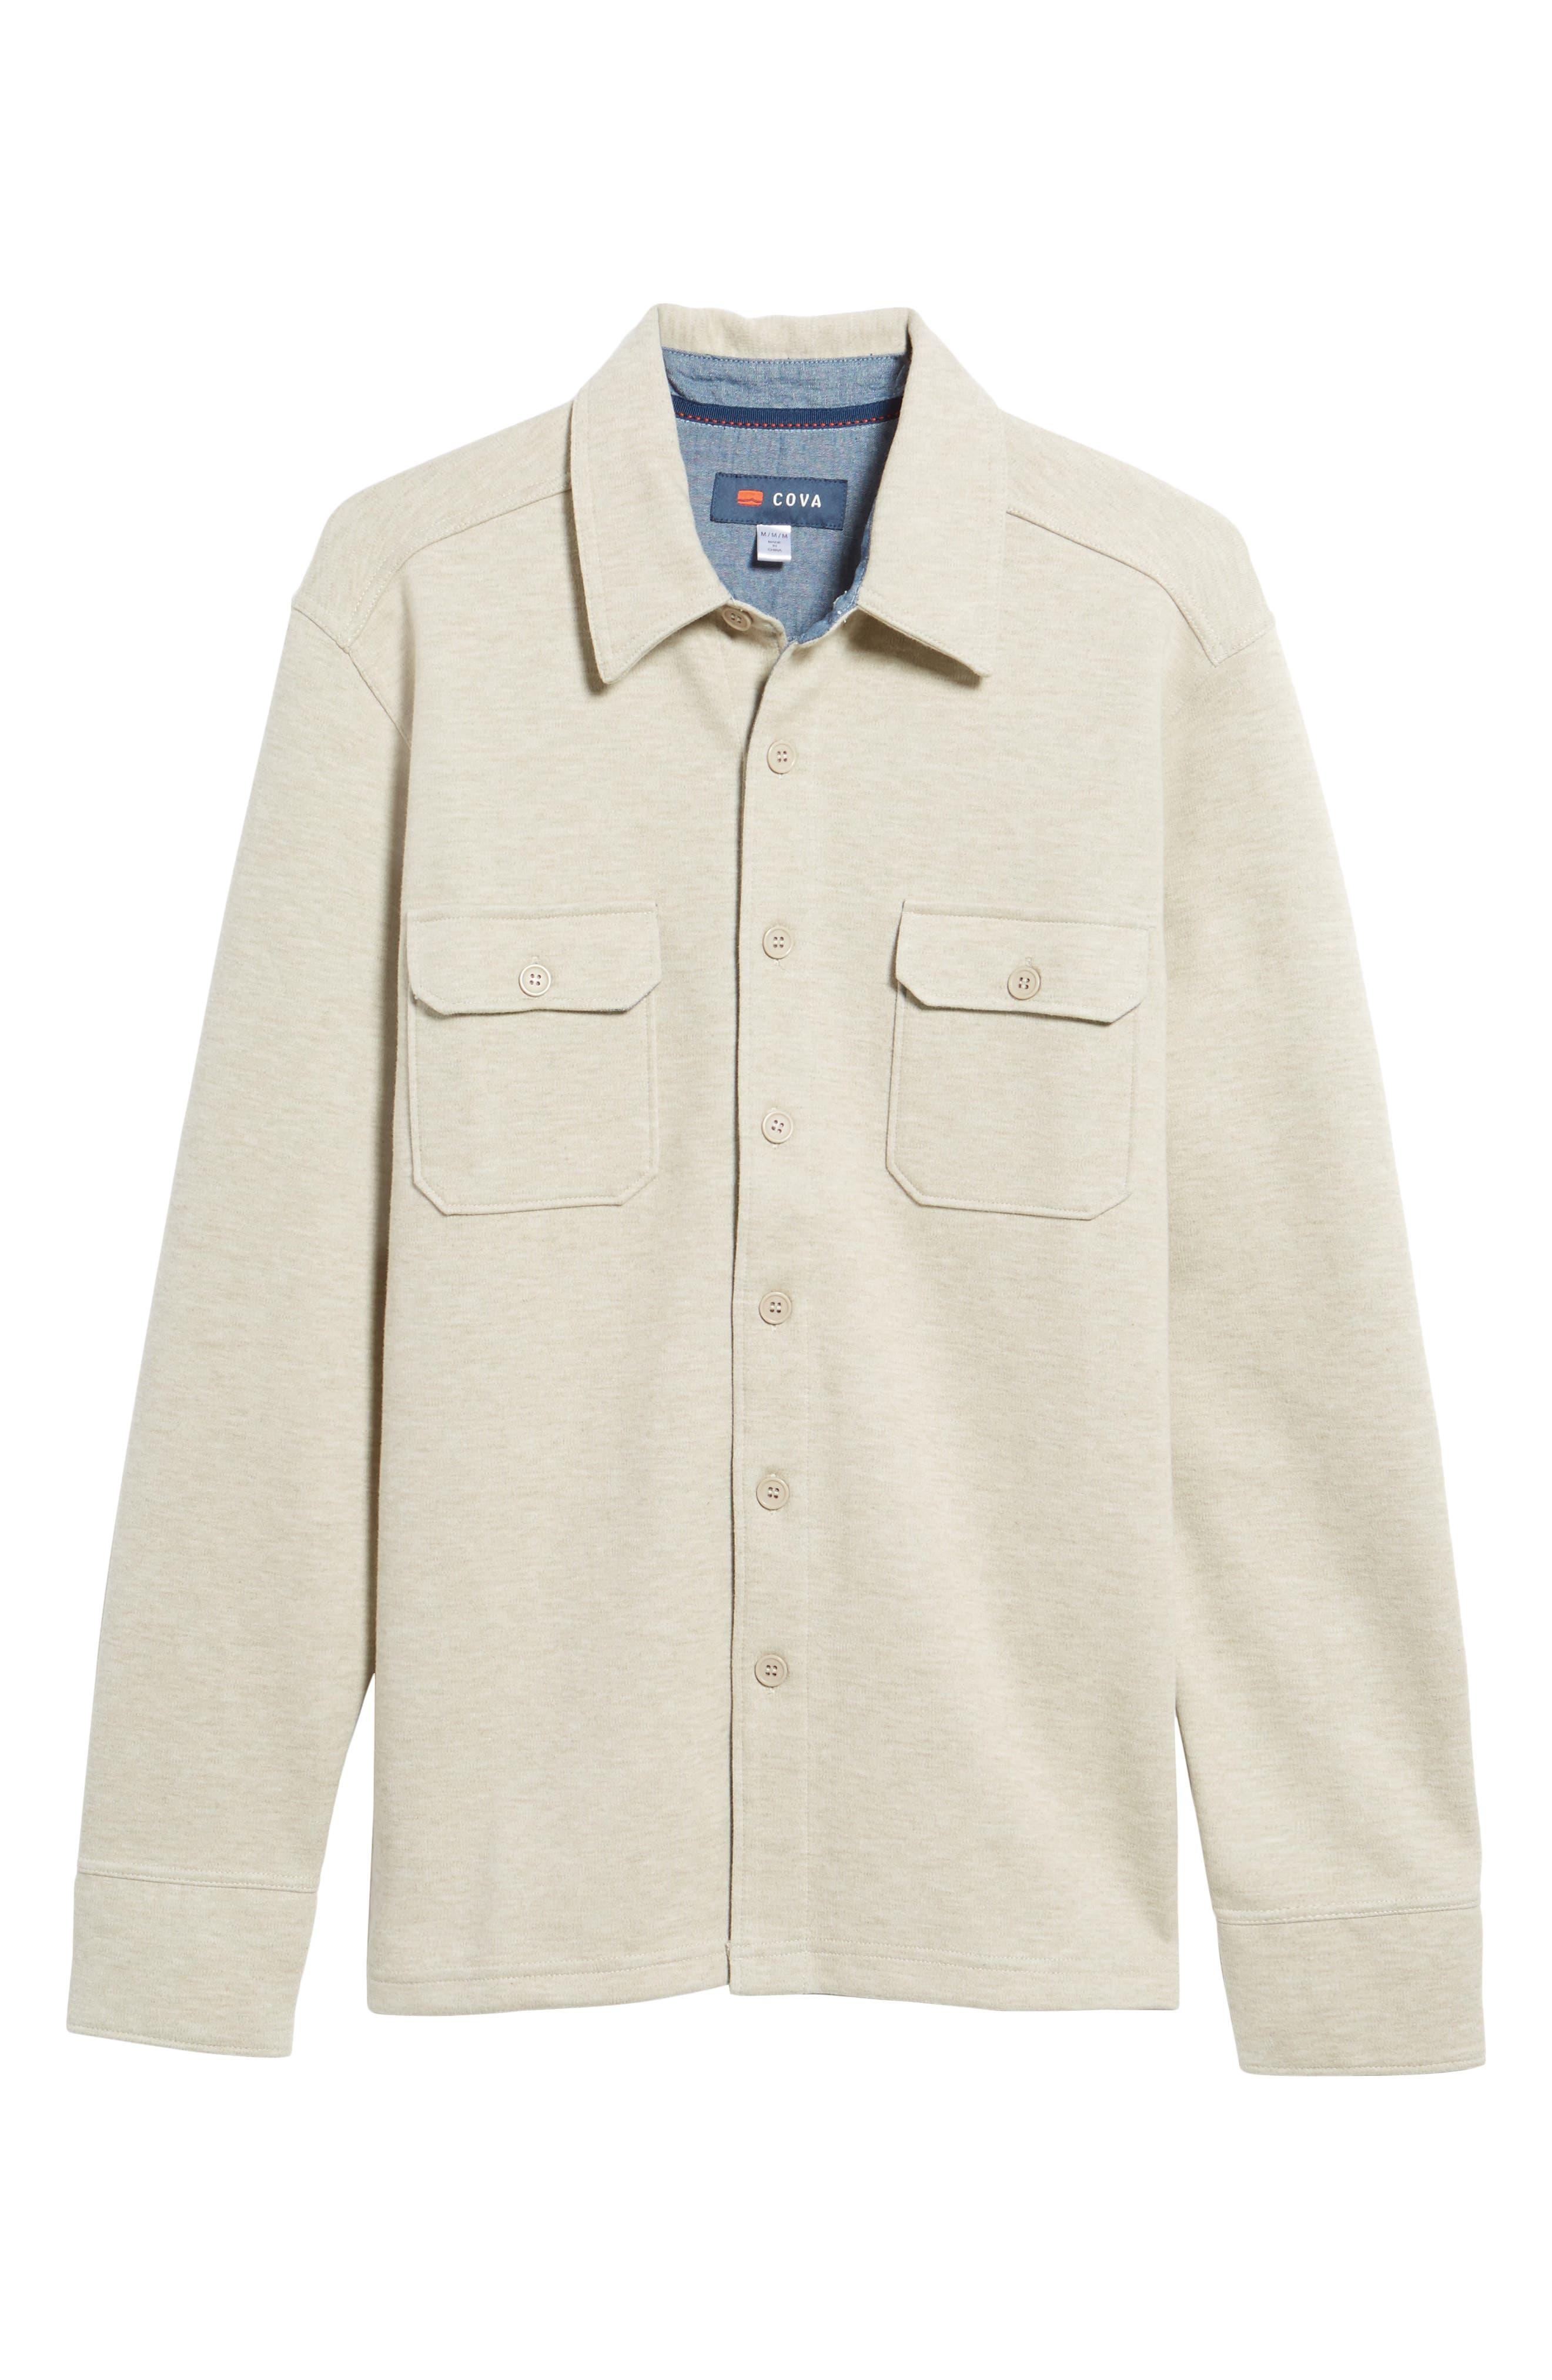 'Longitude' Flap Pocket Fleece Shirt,                             Alternate thumbnail 6, color,                             Bamboo Ivory